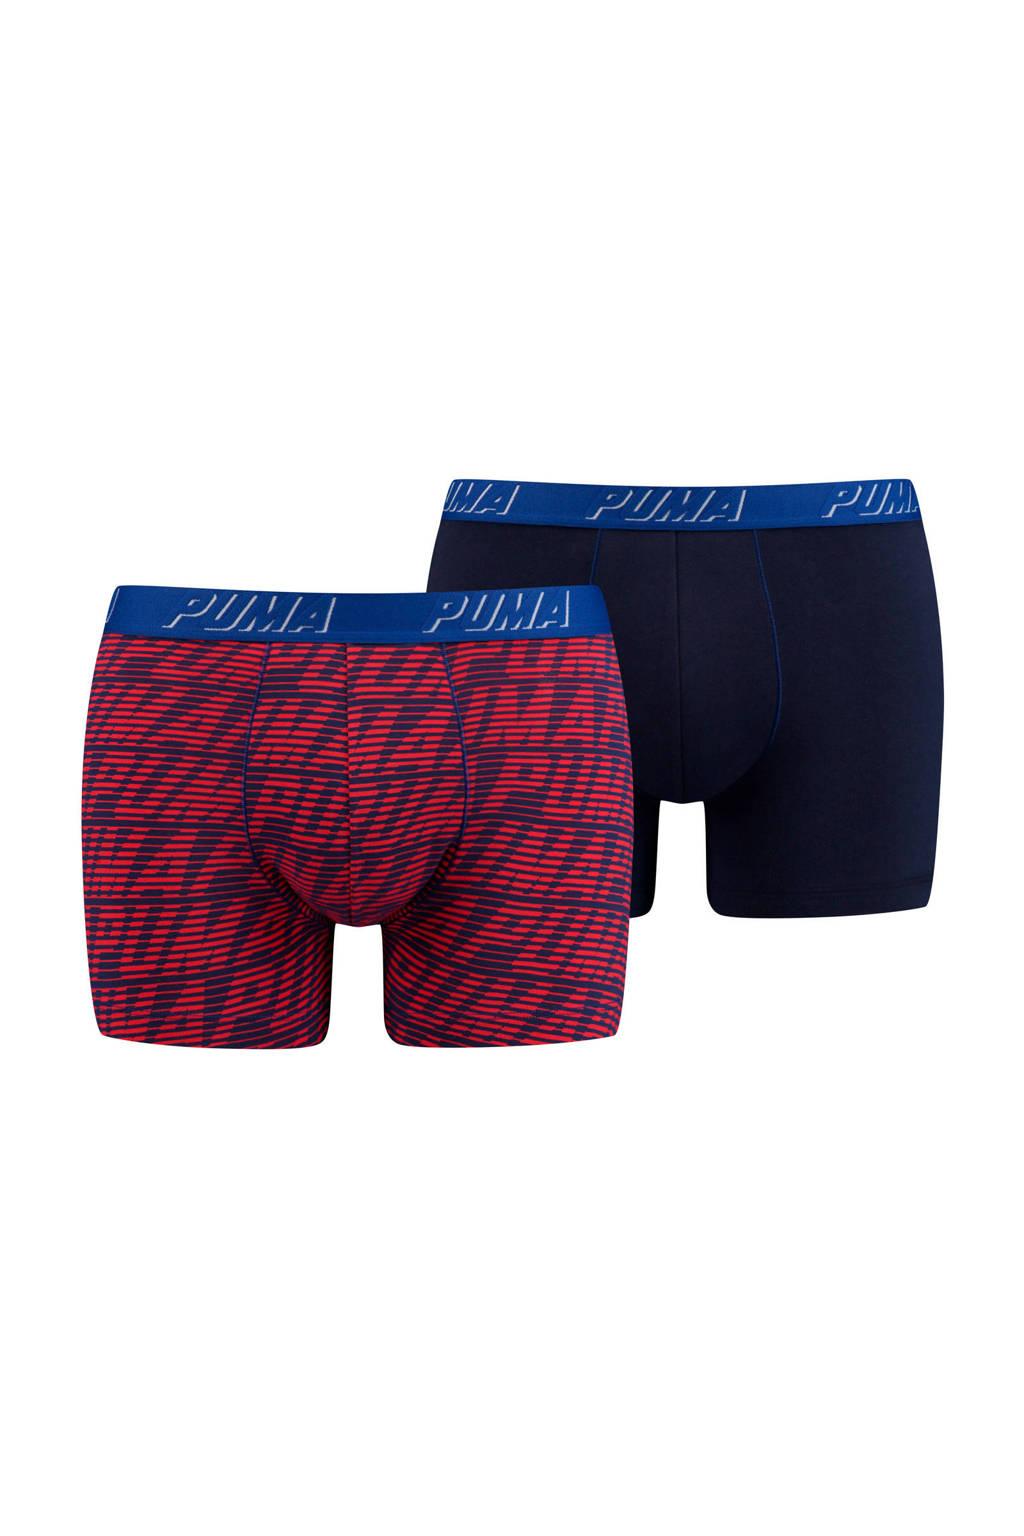 Puma Bodywear boxershort (set van 2), Rood/zwart